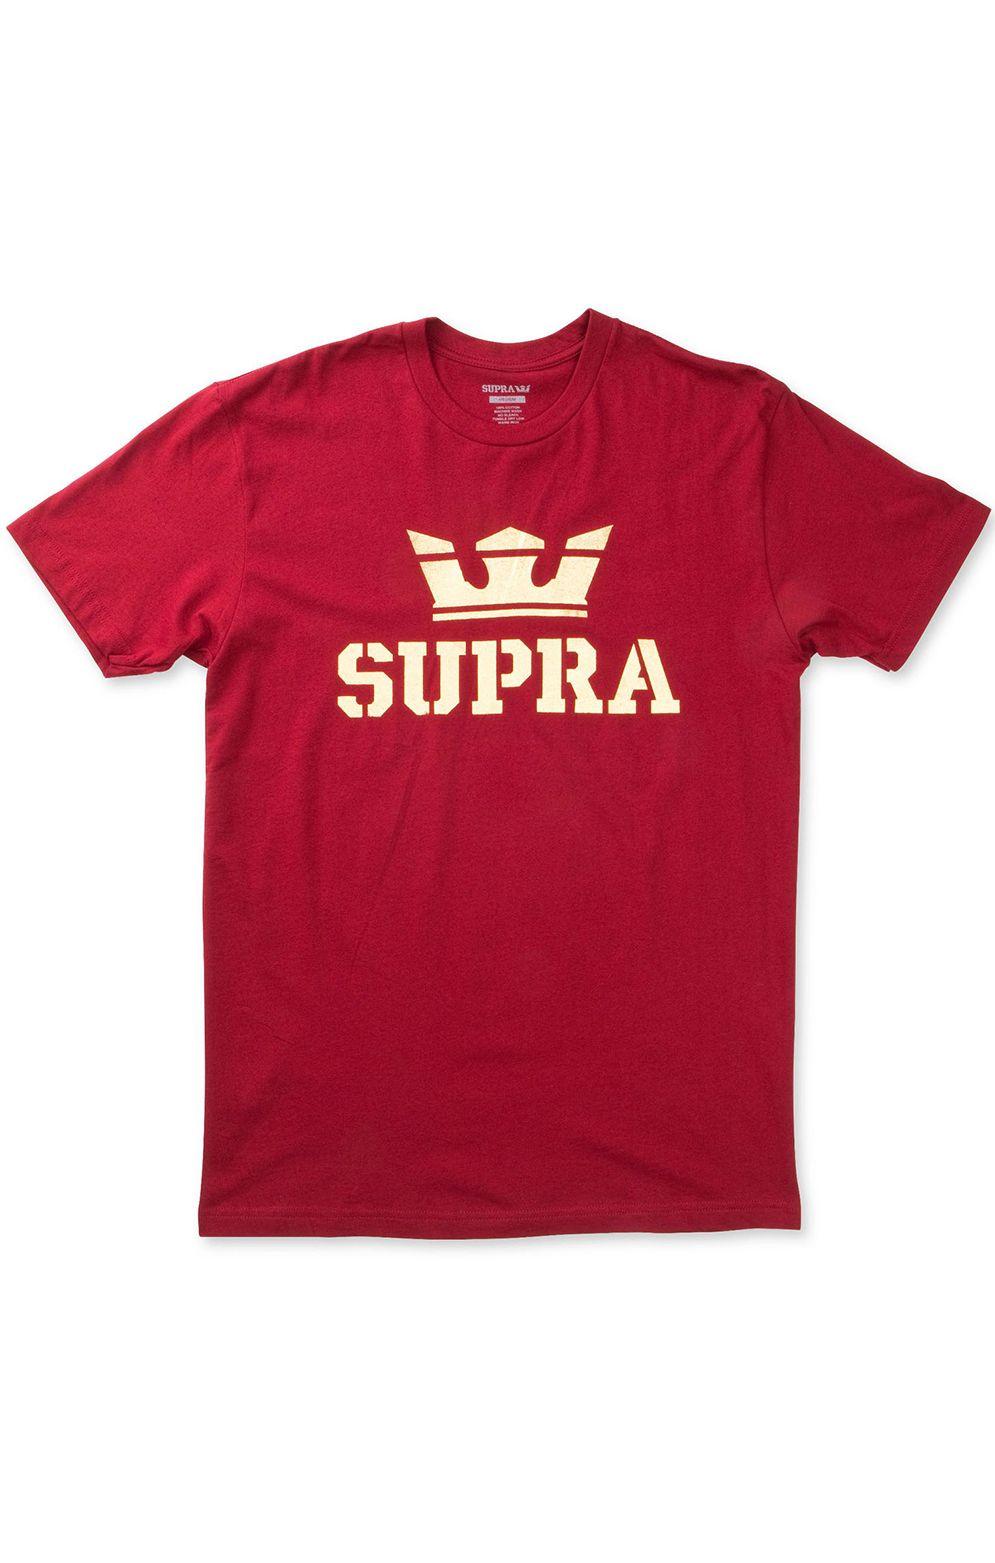 T-Shirt Supra ABOVE REGULAR Rose/Gold